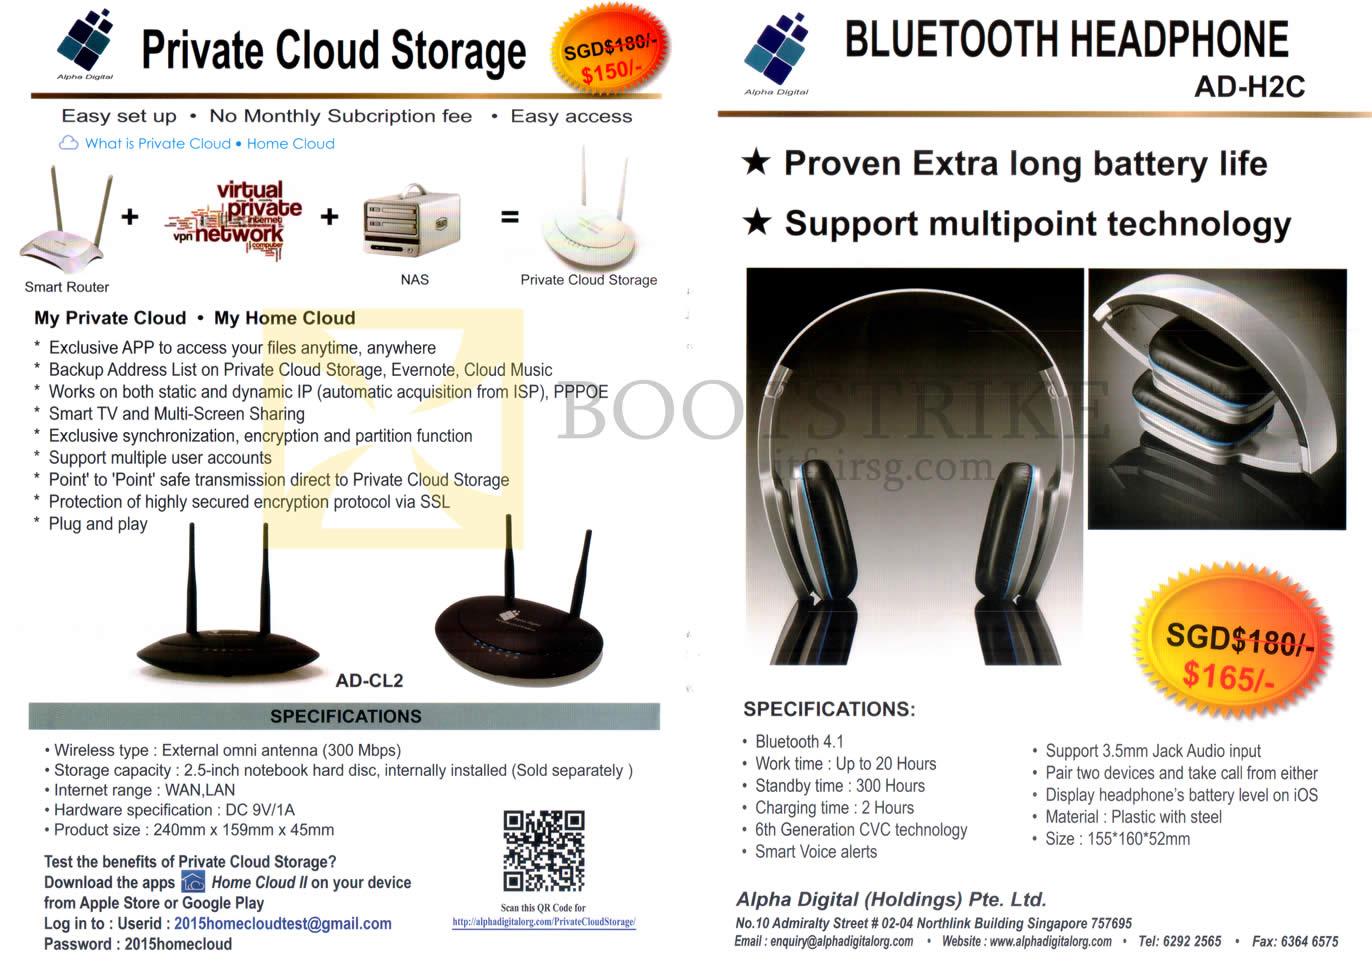 Alpha Digital Private Cloud Storage AD-CL2, Bluetooth